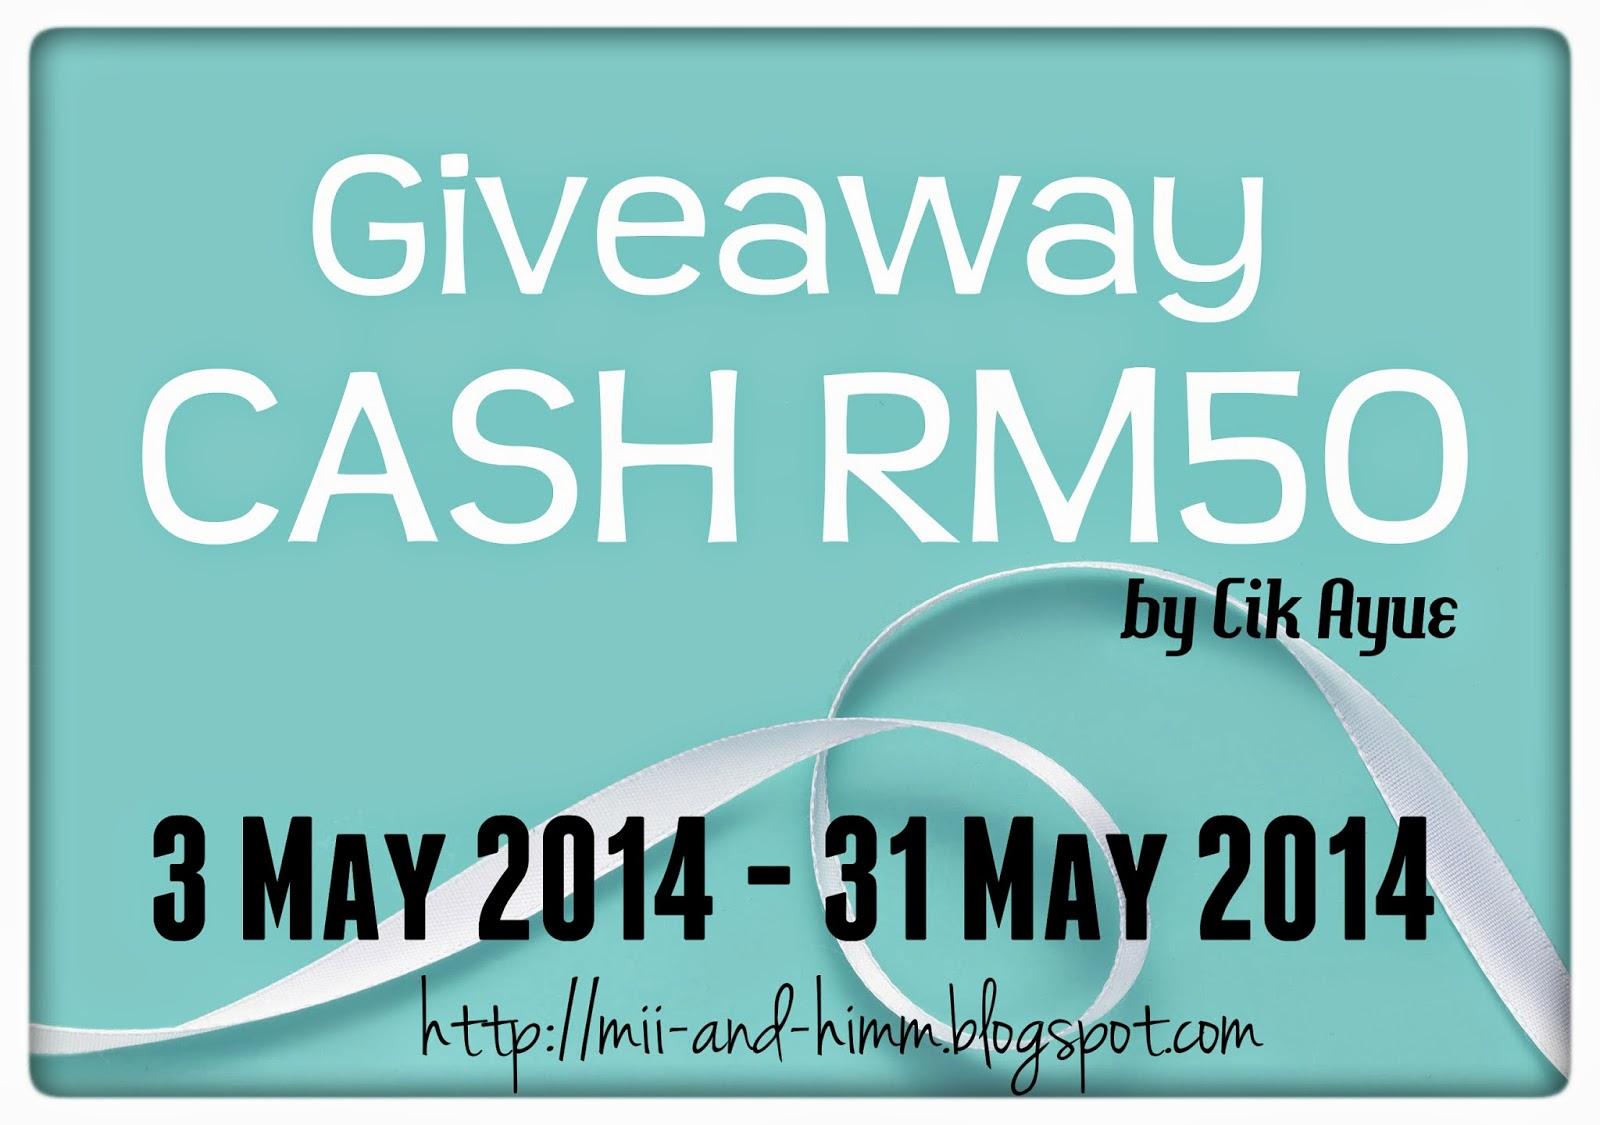 GiveAway CASH RM50 by Cik Ayue